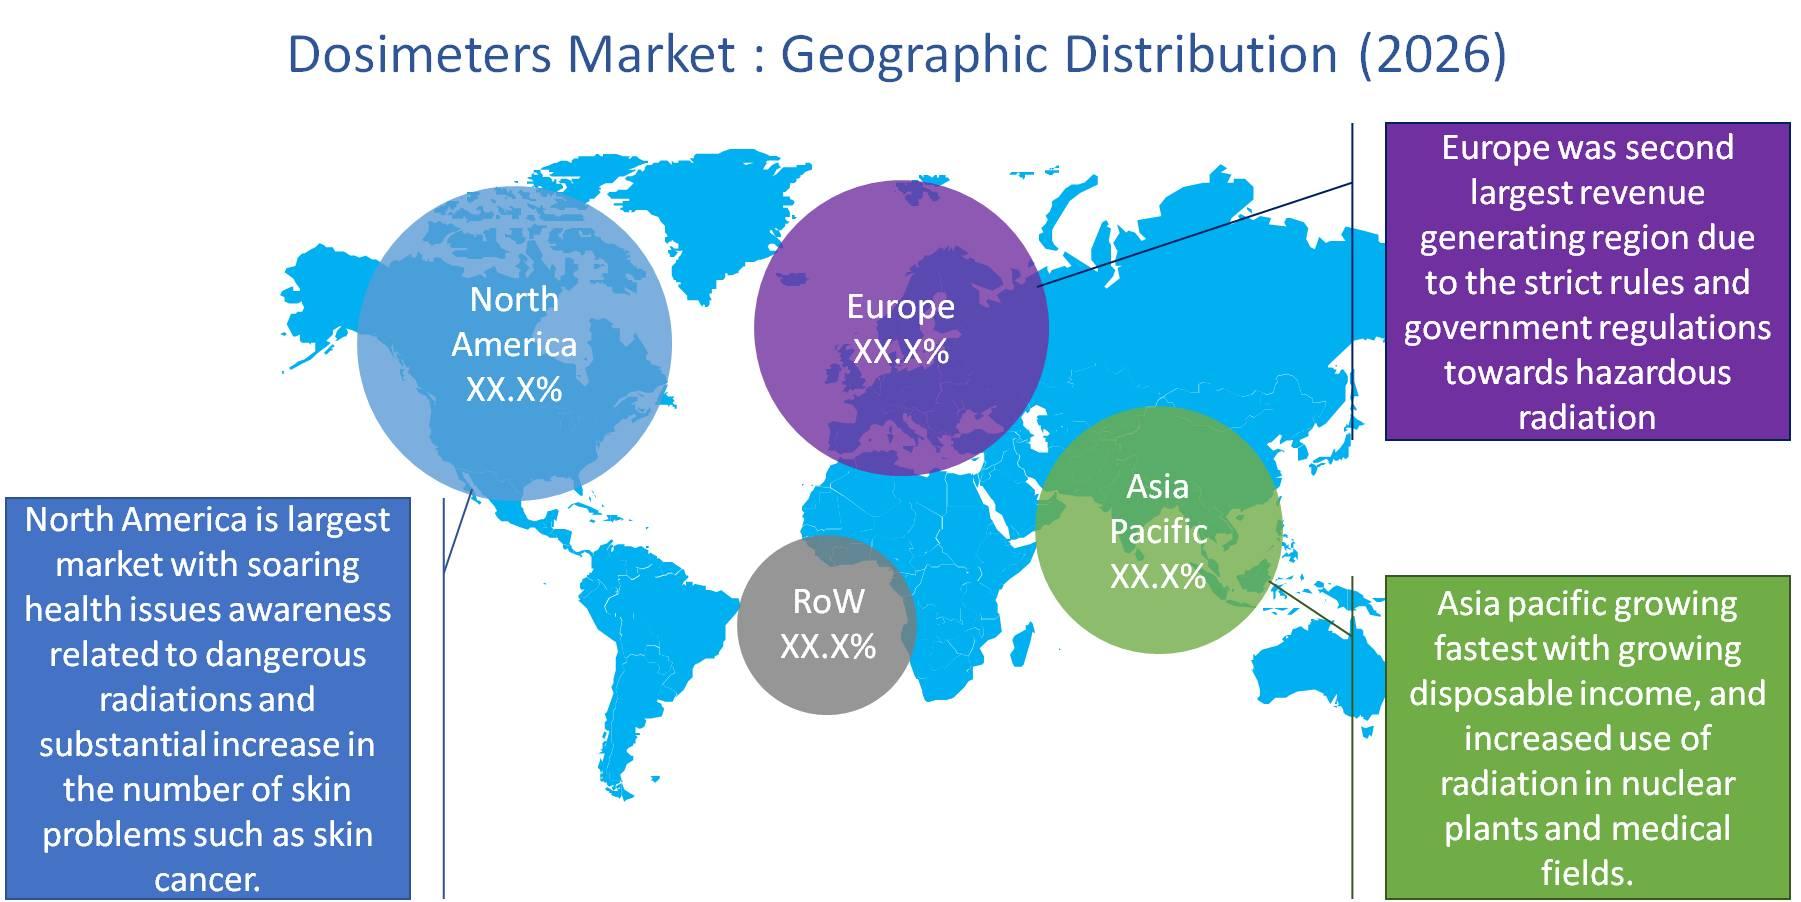 Dosimeters Market